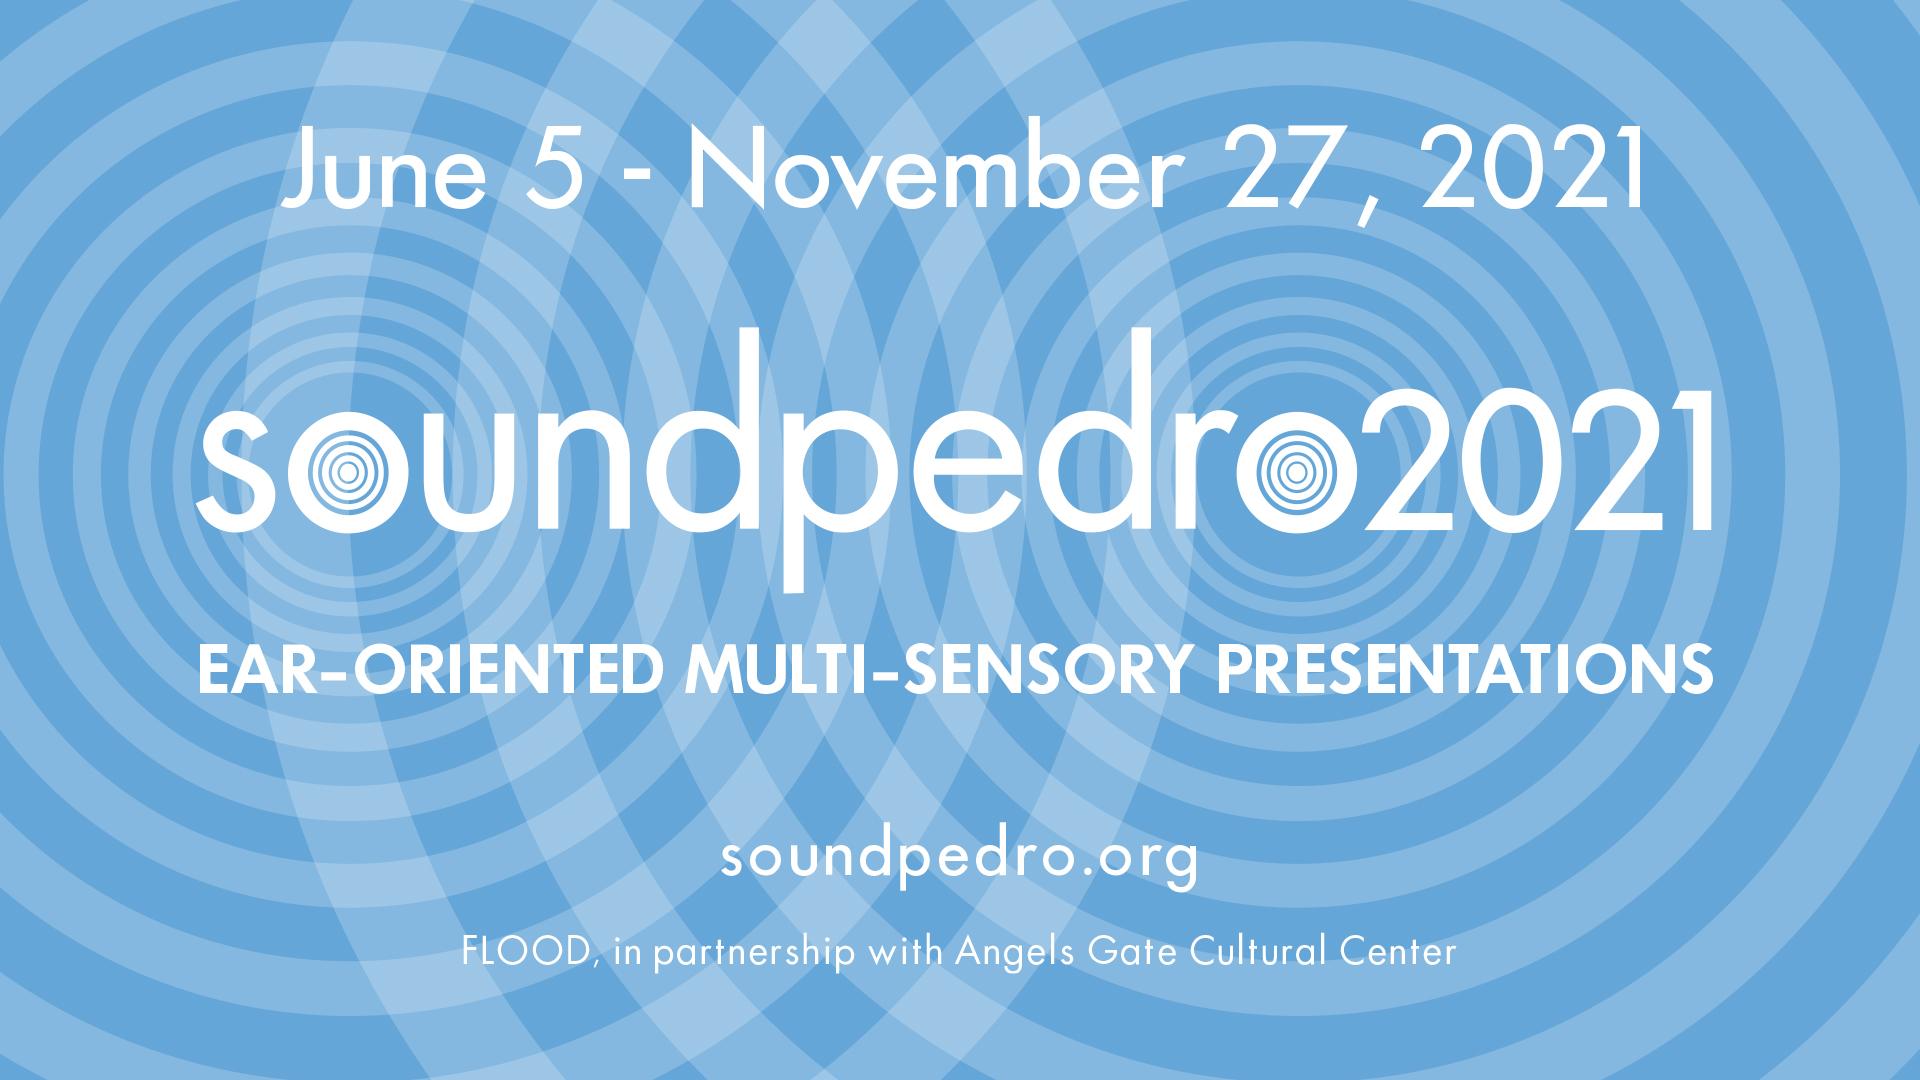 soundpedro2021 official poster